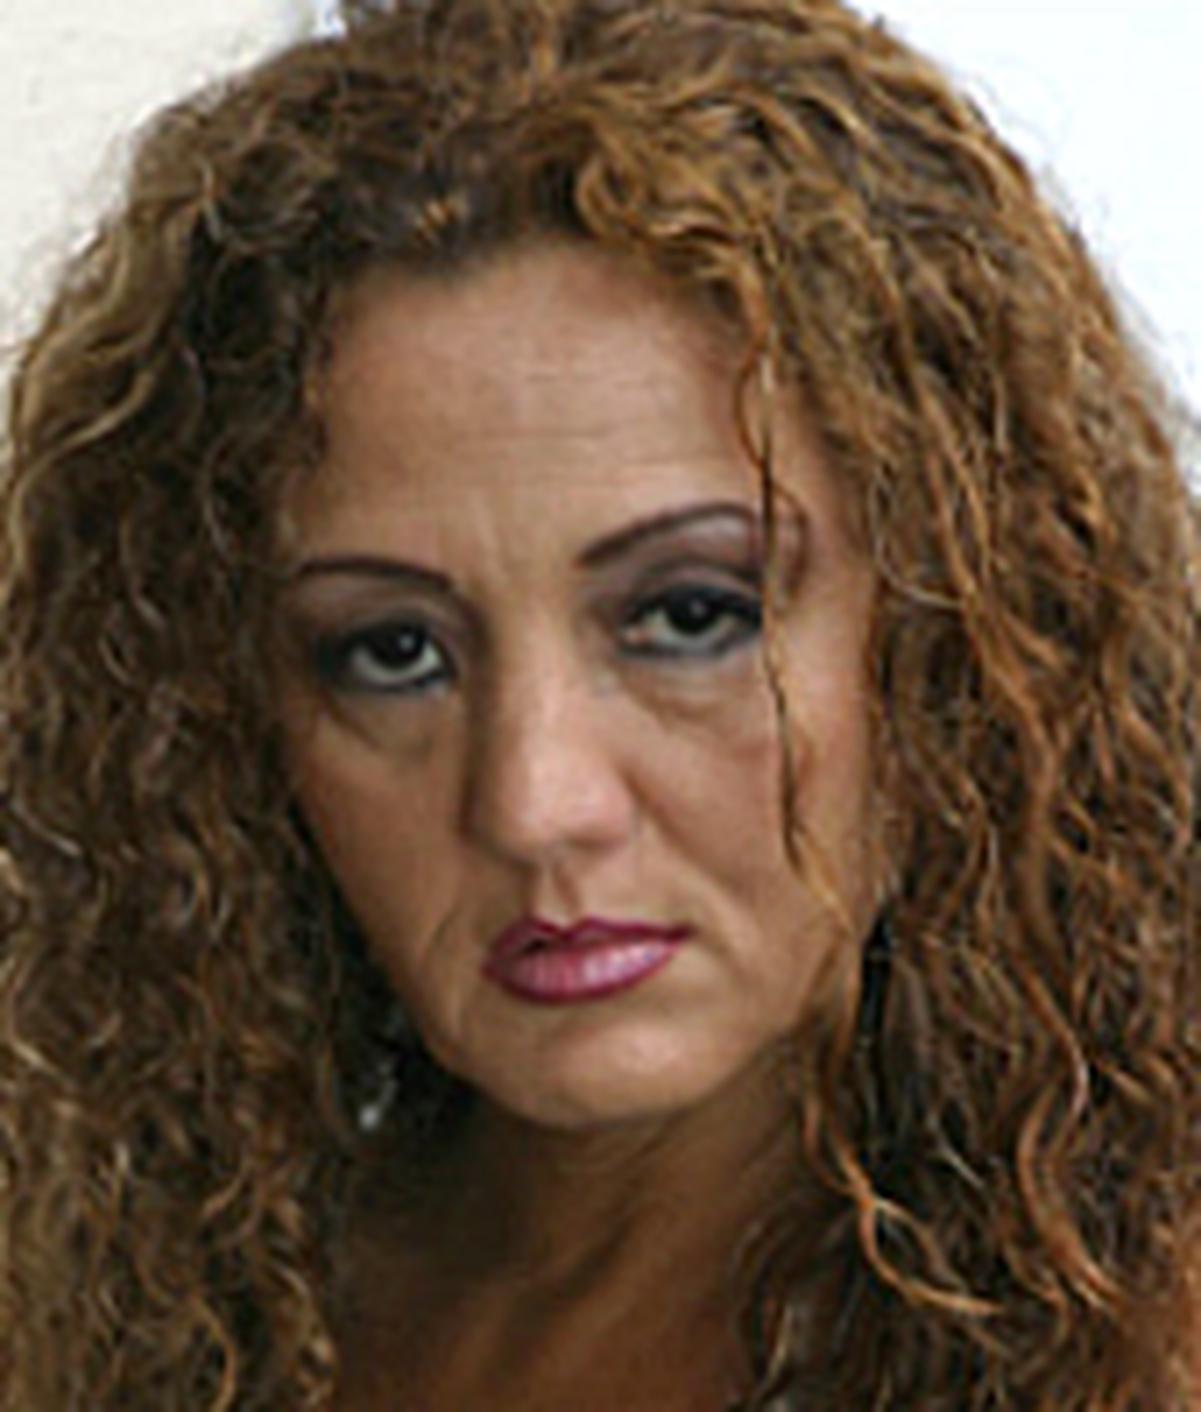 Melanie Hotlips Wiki & Bio - Pornographic Actress